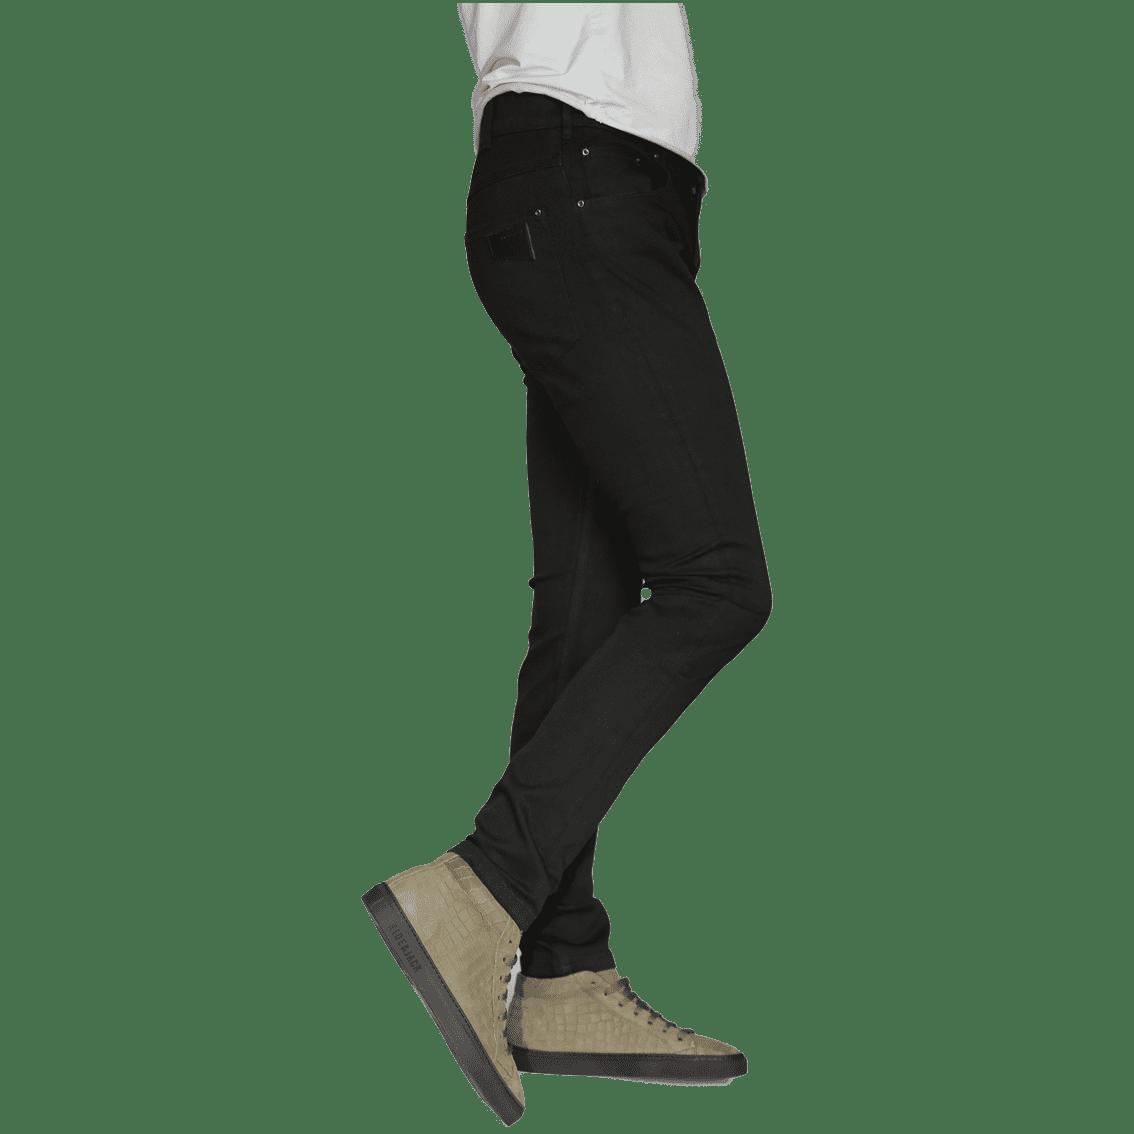 Cabinero Stiles Berlin Jeans Johnny Love, schwarz Herrenhosen 2017 3